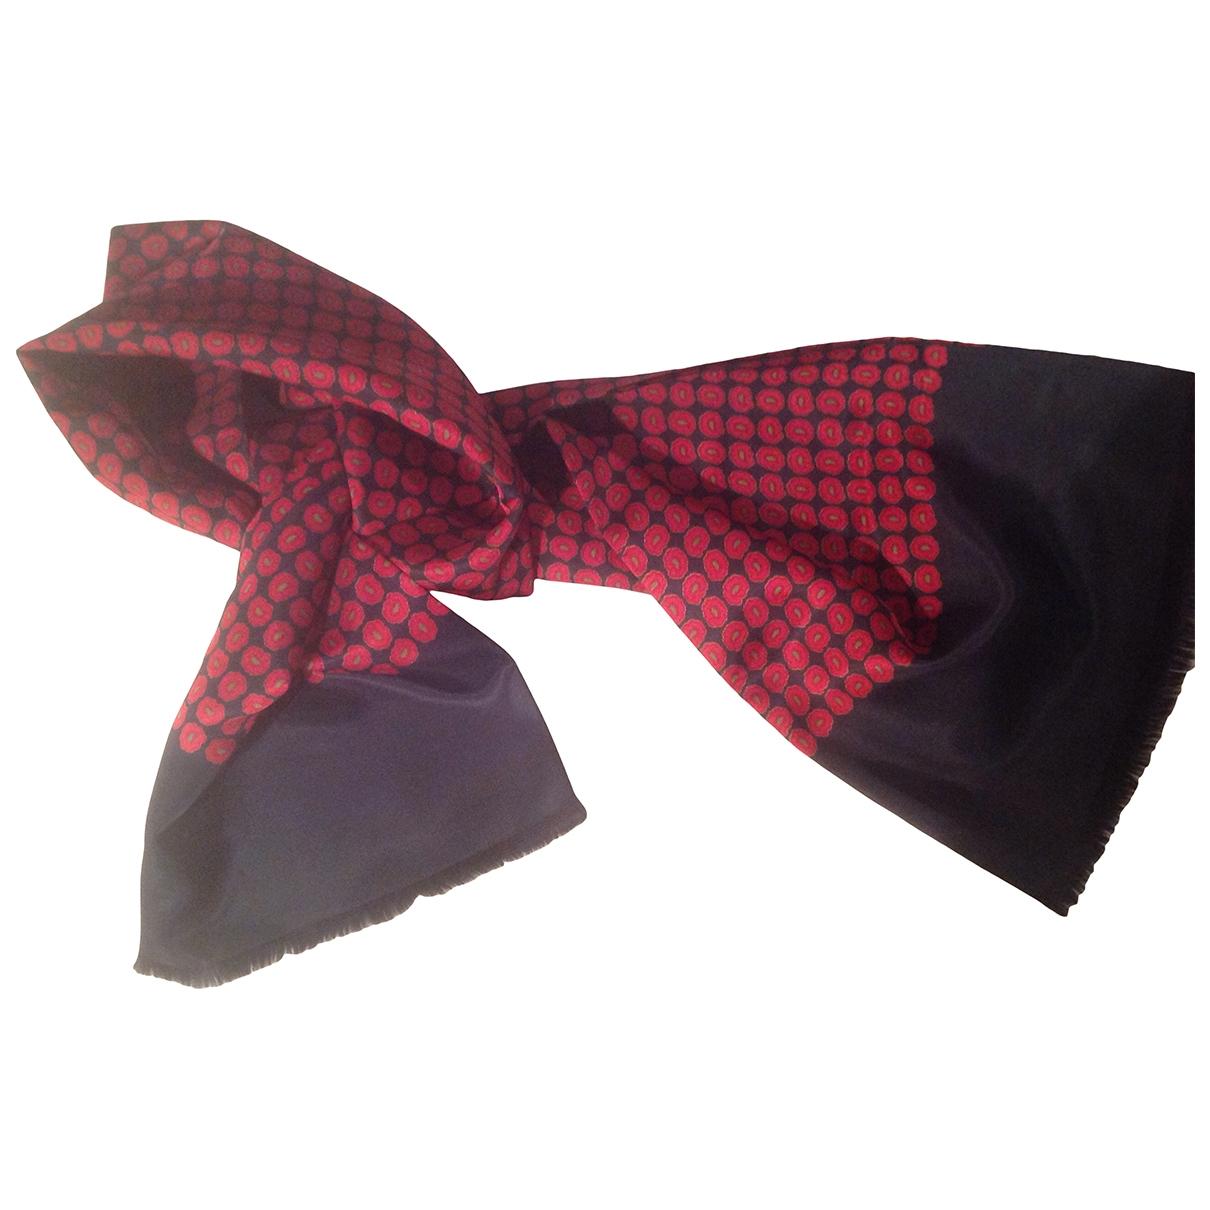 Pañuelo / bufanda de Seda Non Signe / Unsigned